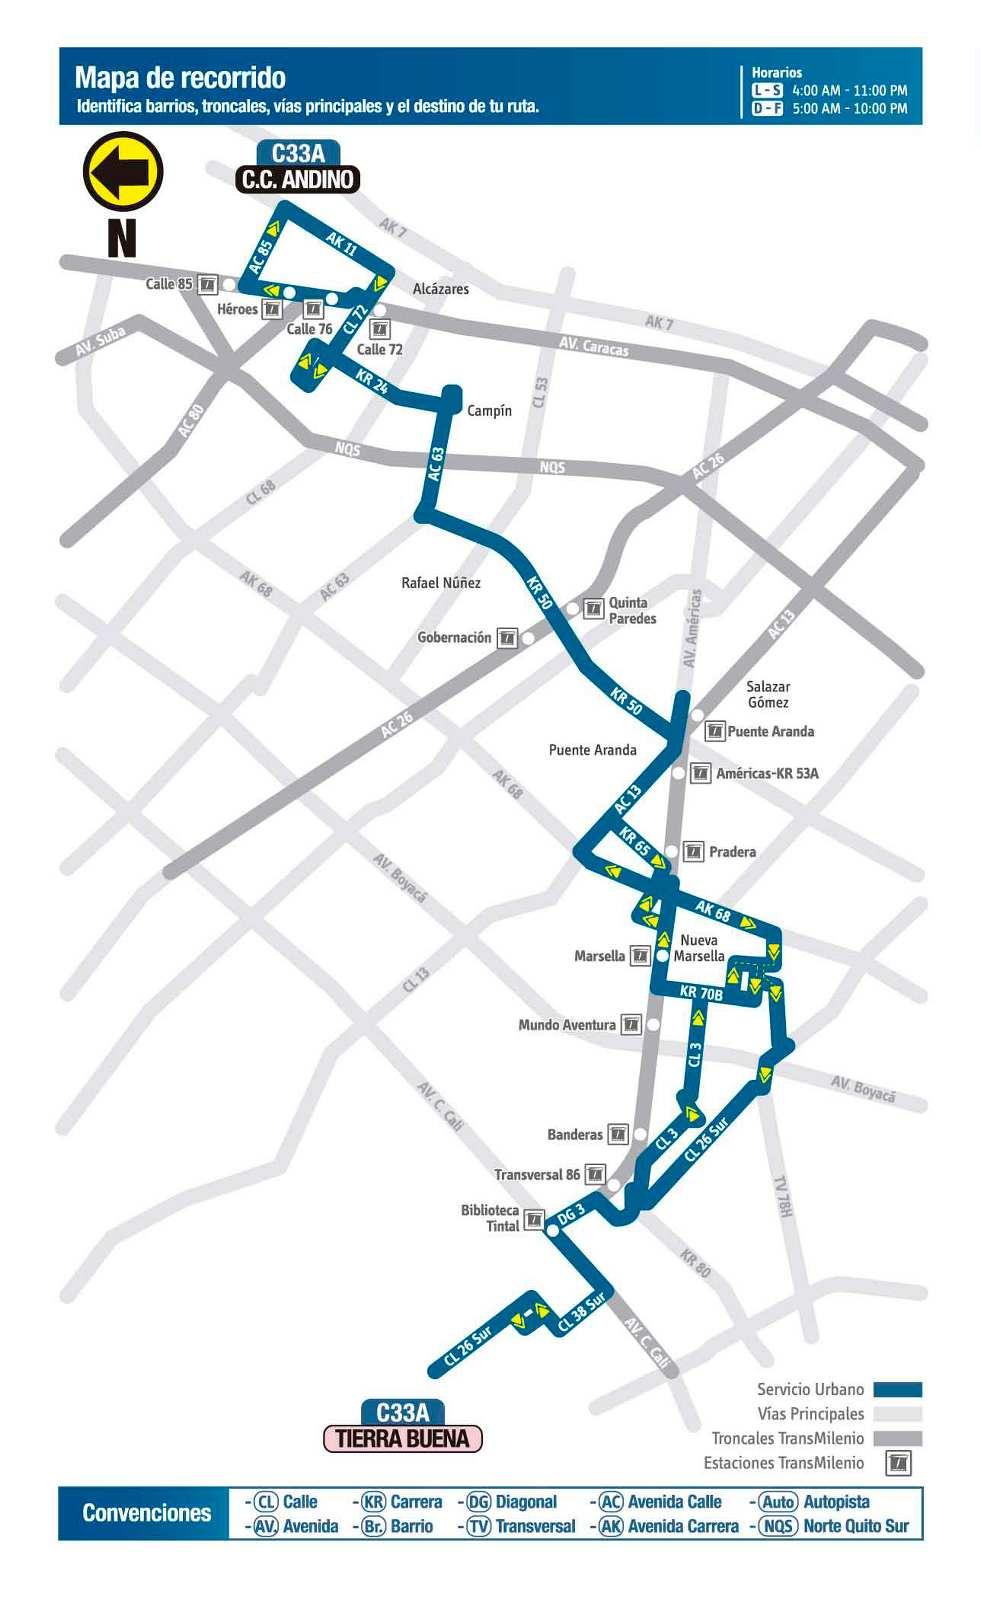 Ruta SITP: C33A > Centro Comercial Andino ↔ Tierra Buena (mapa)